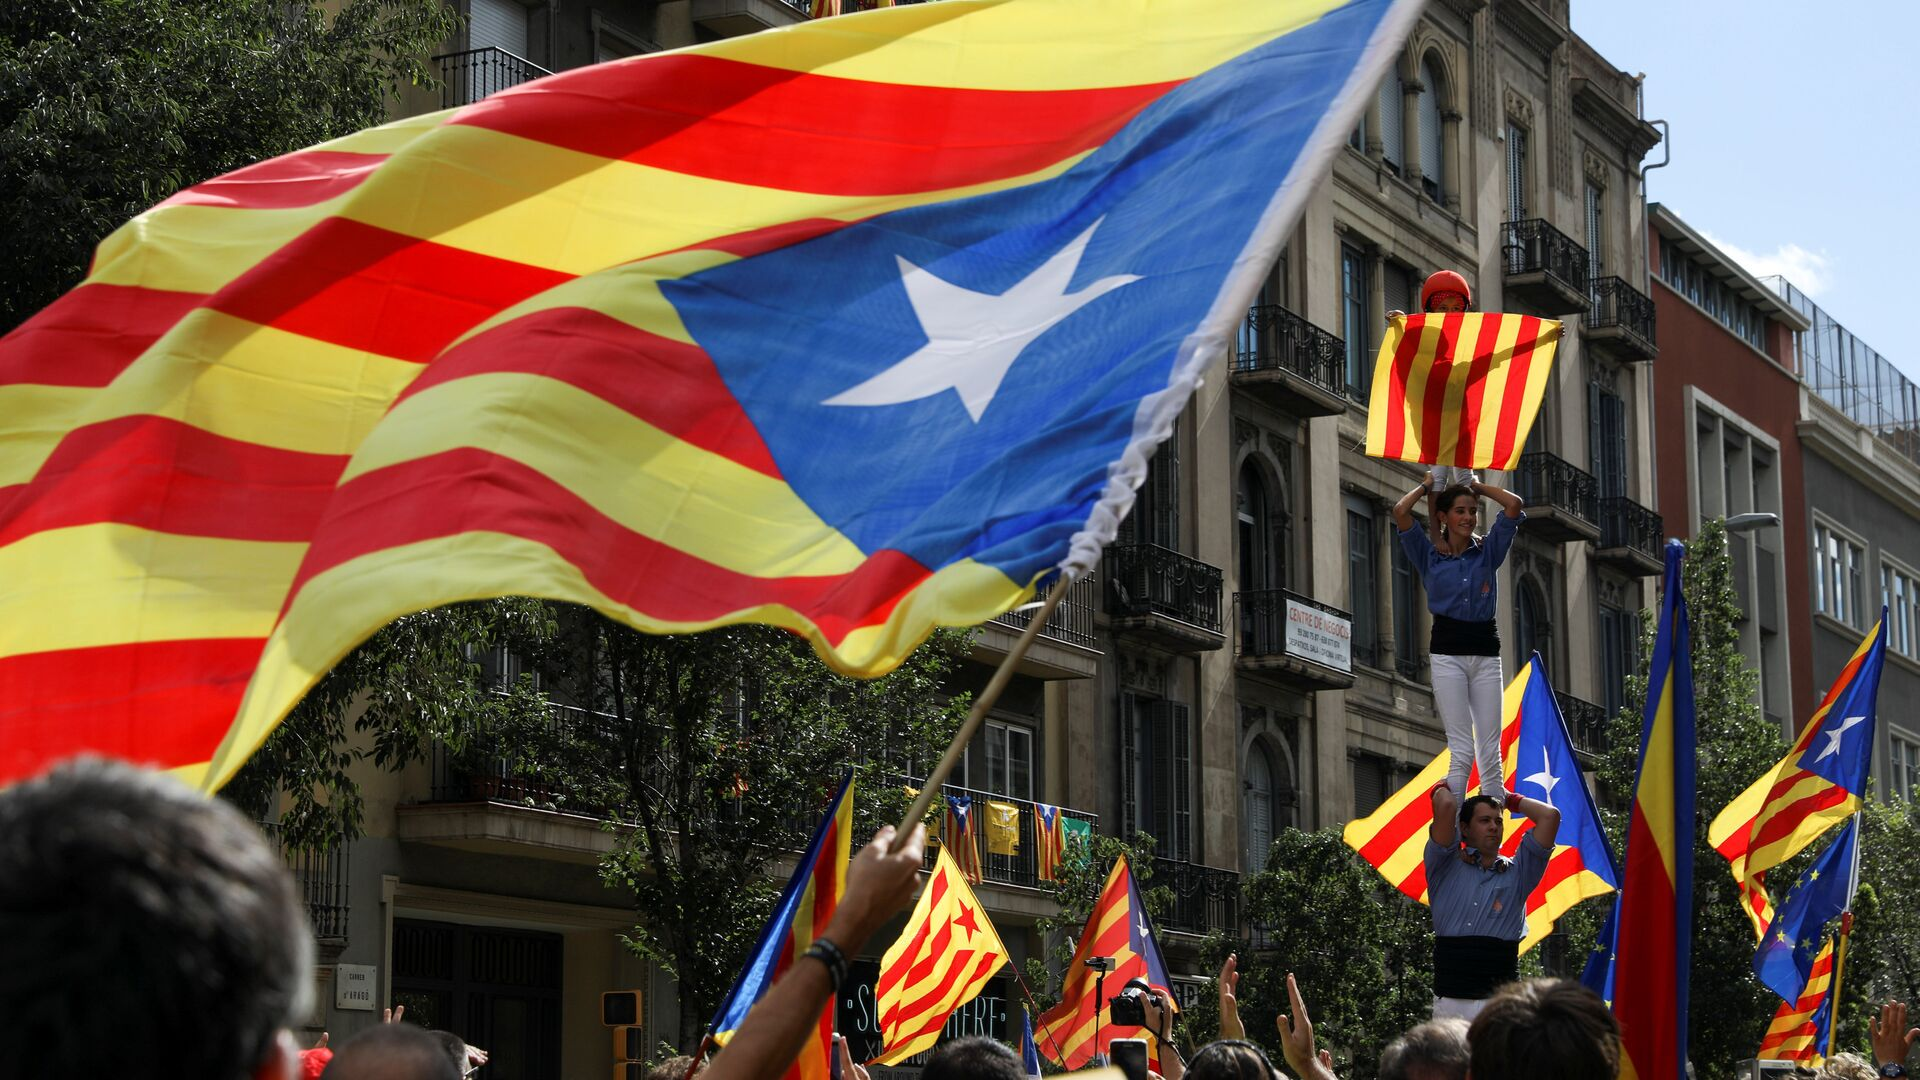 Estelada, bandera independentista de Cataluña - Sputnik Mundo, 1920, 10.09.2021